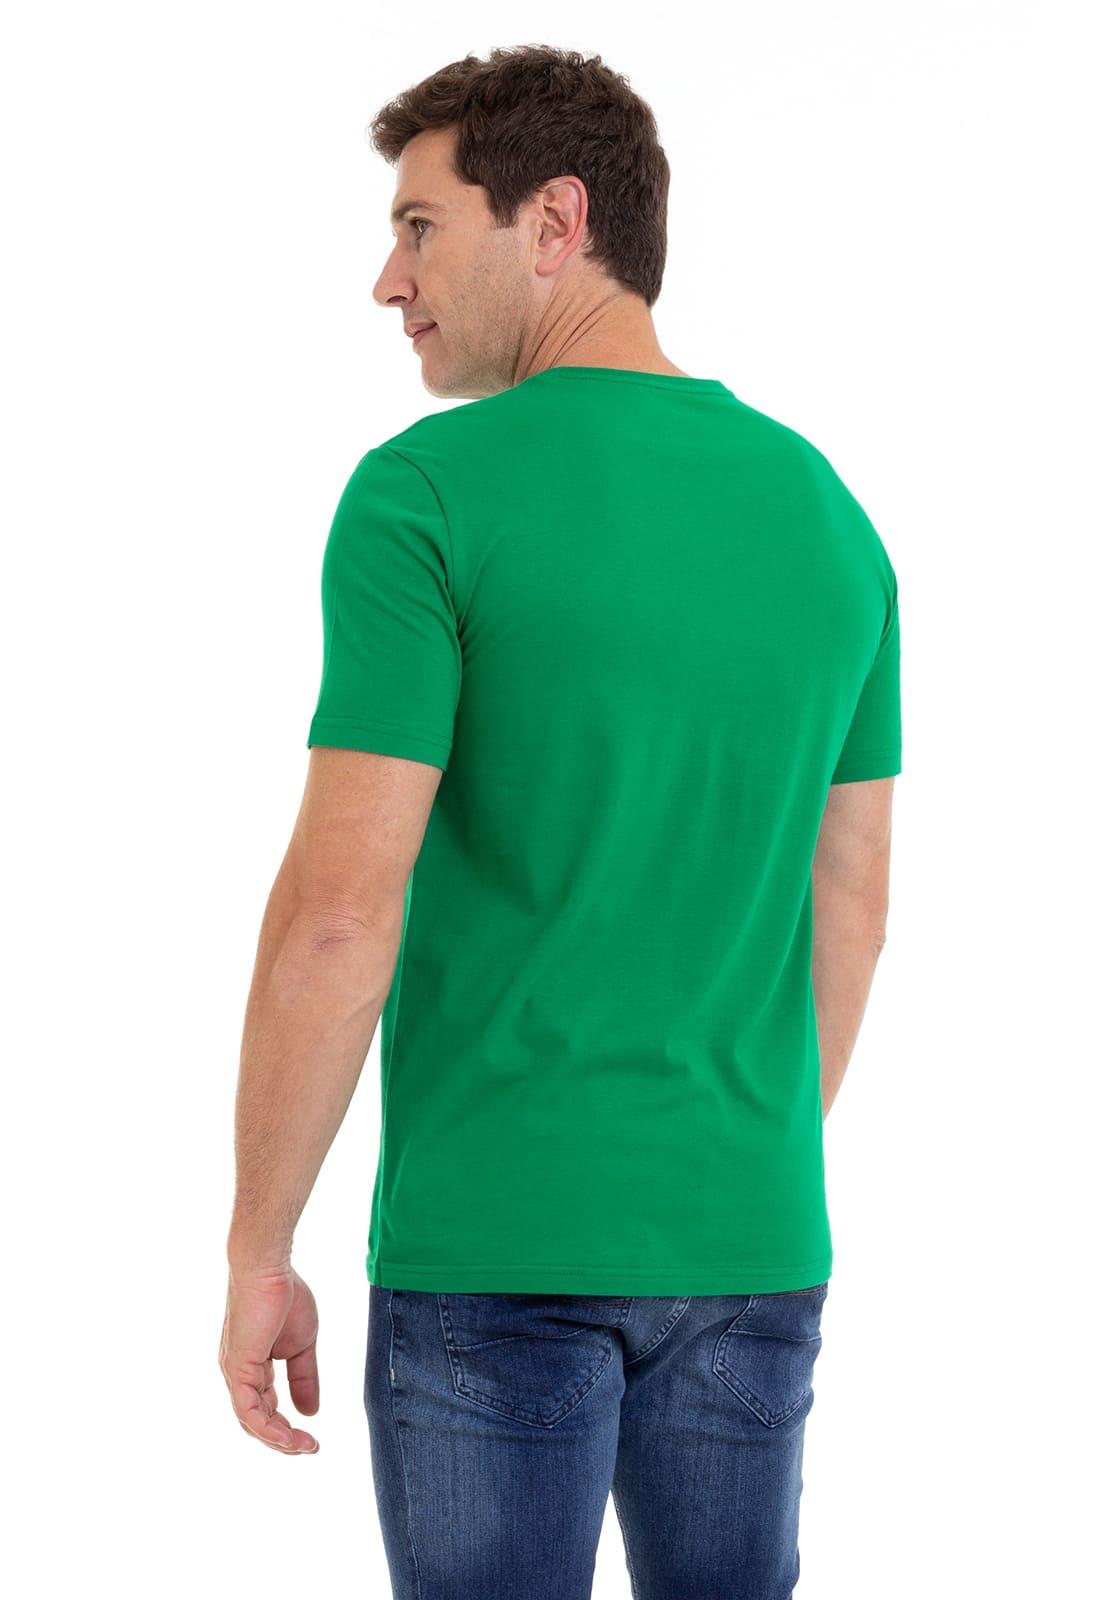 Camiseta Masculina 100% Algodão Super Premium, Na Cor Verde Claro